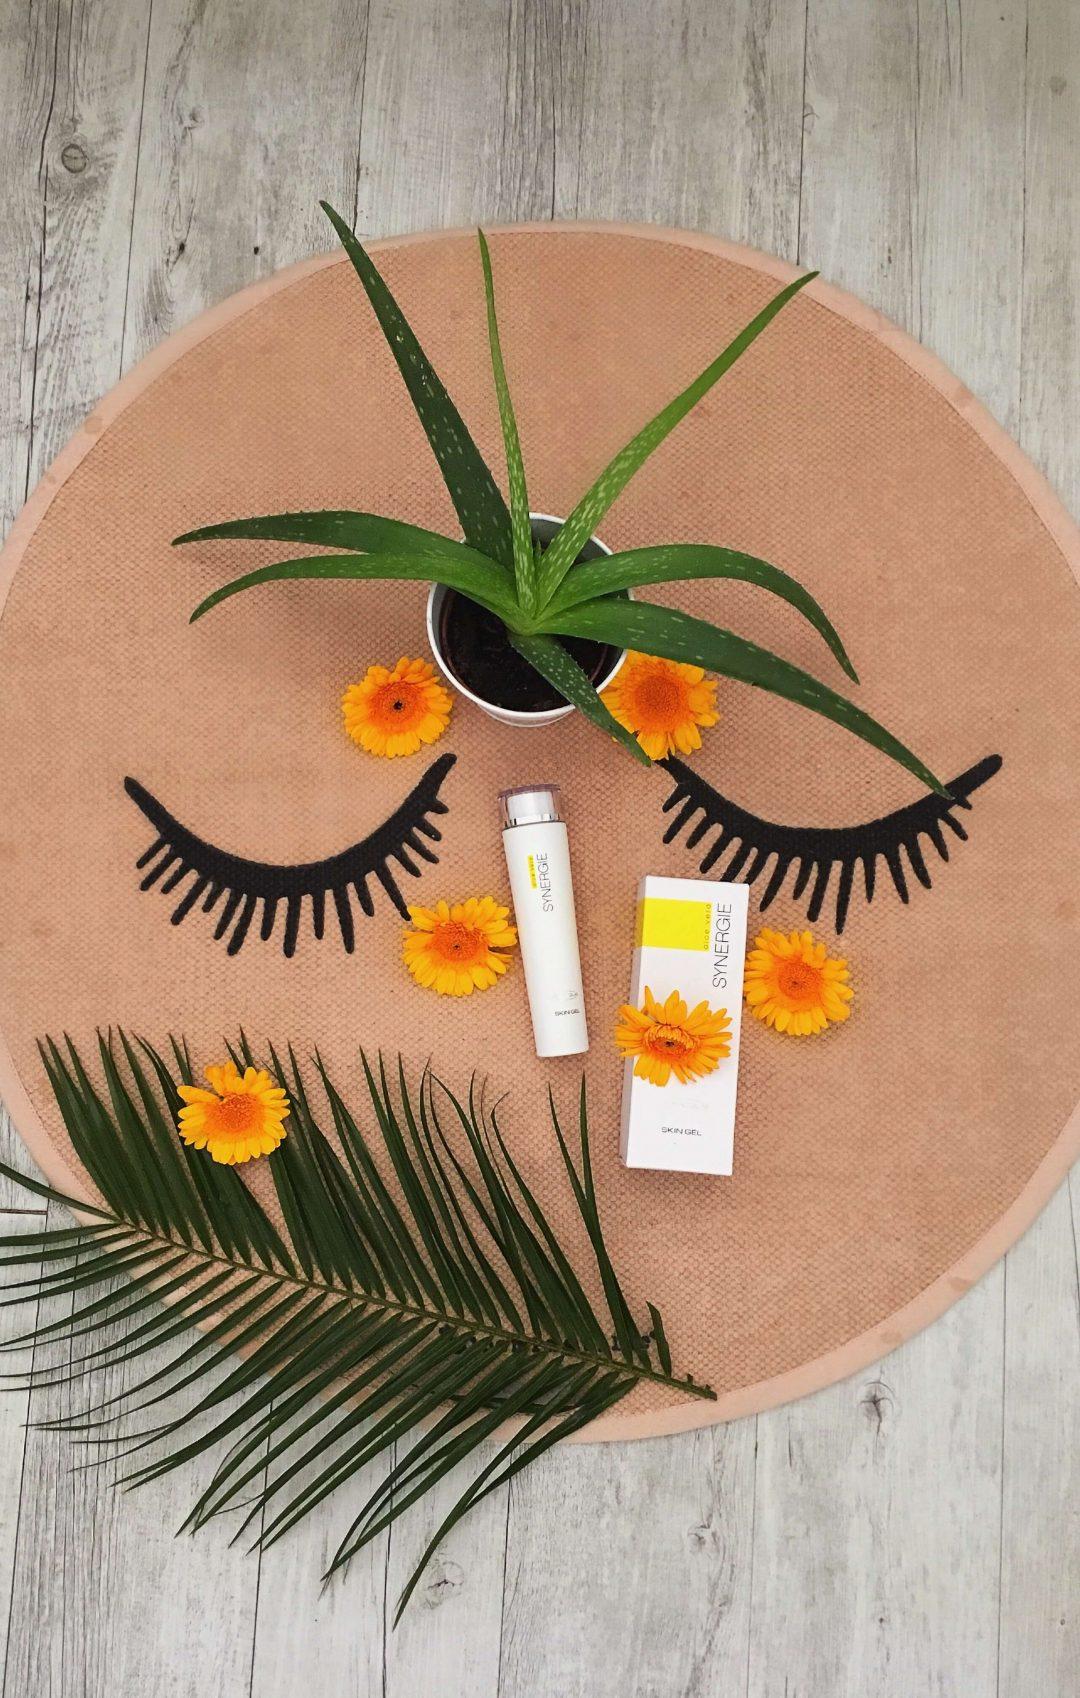 Aloe Vera Synergie Skin Gel